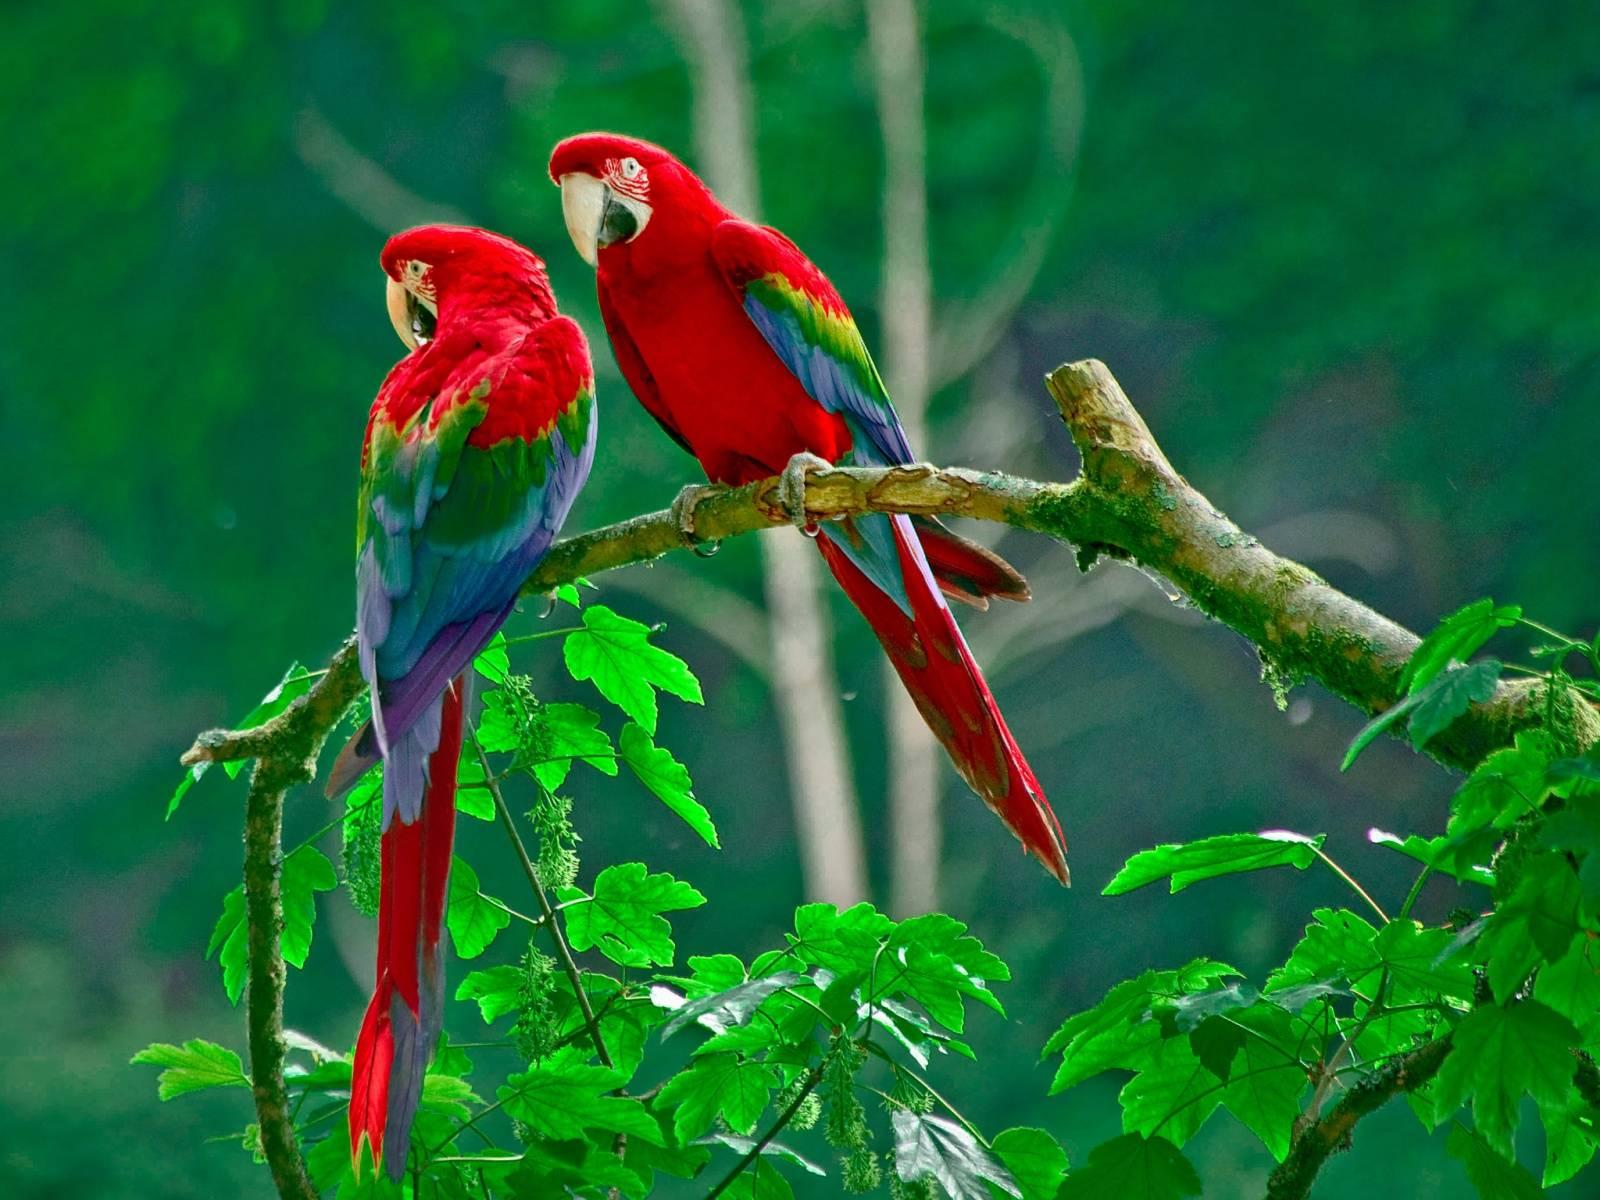 beautiful wallpapers of love birds - wallpaper cave